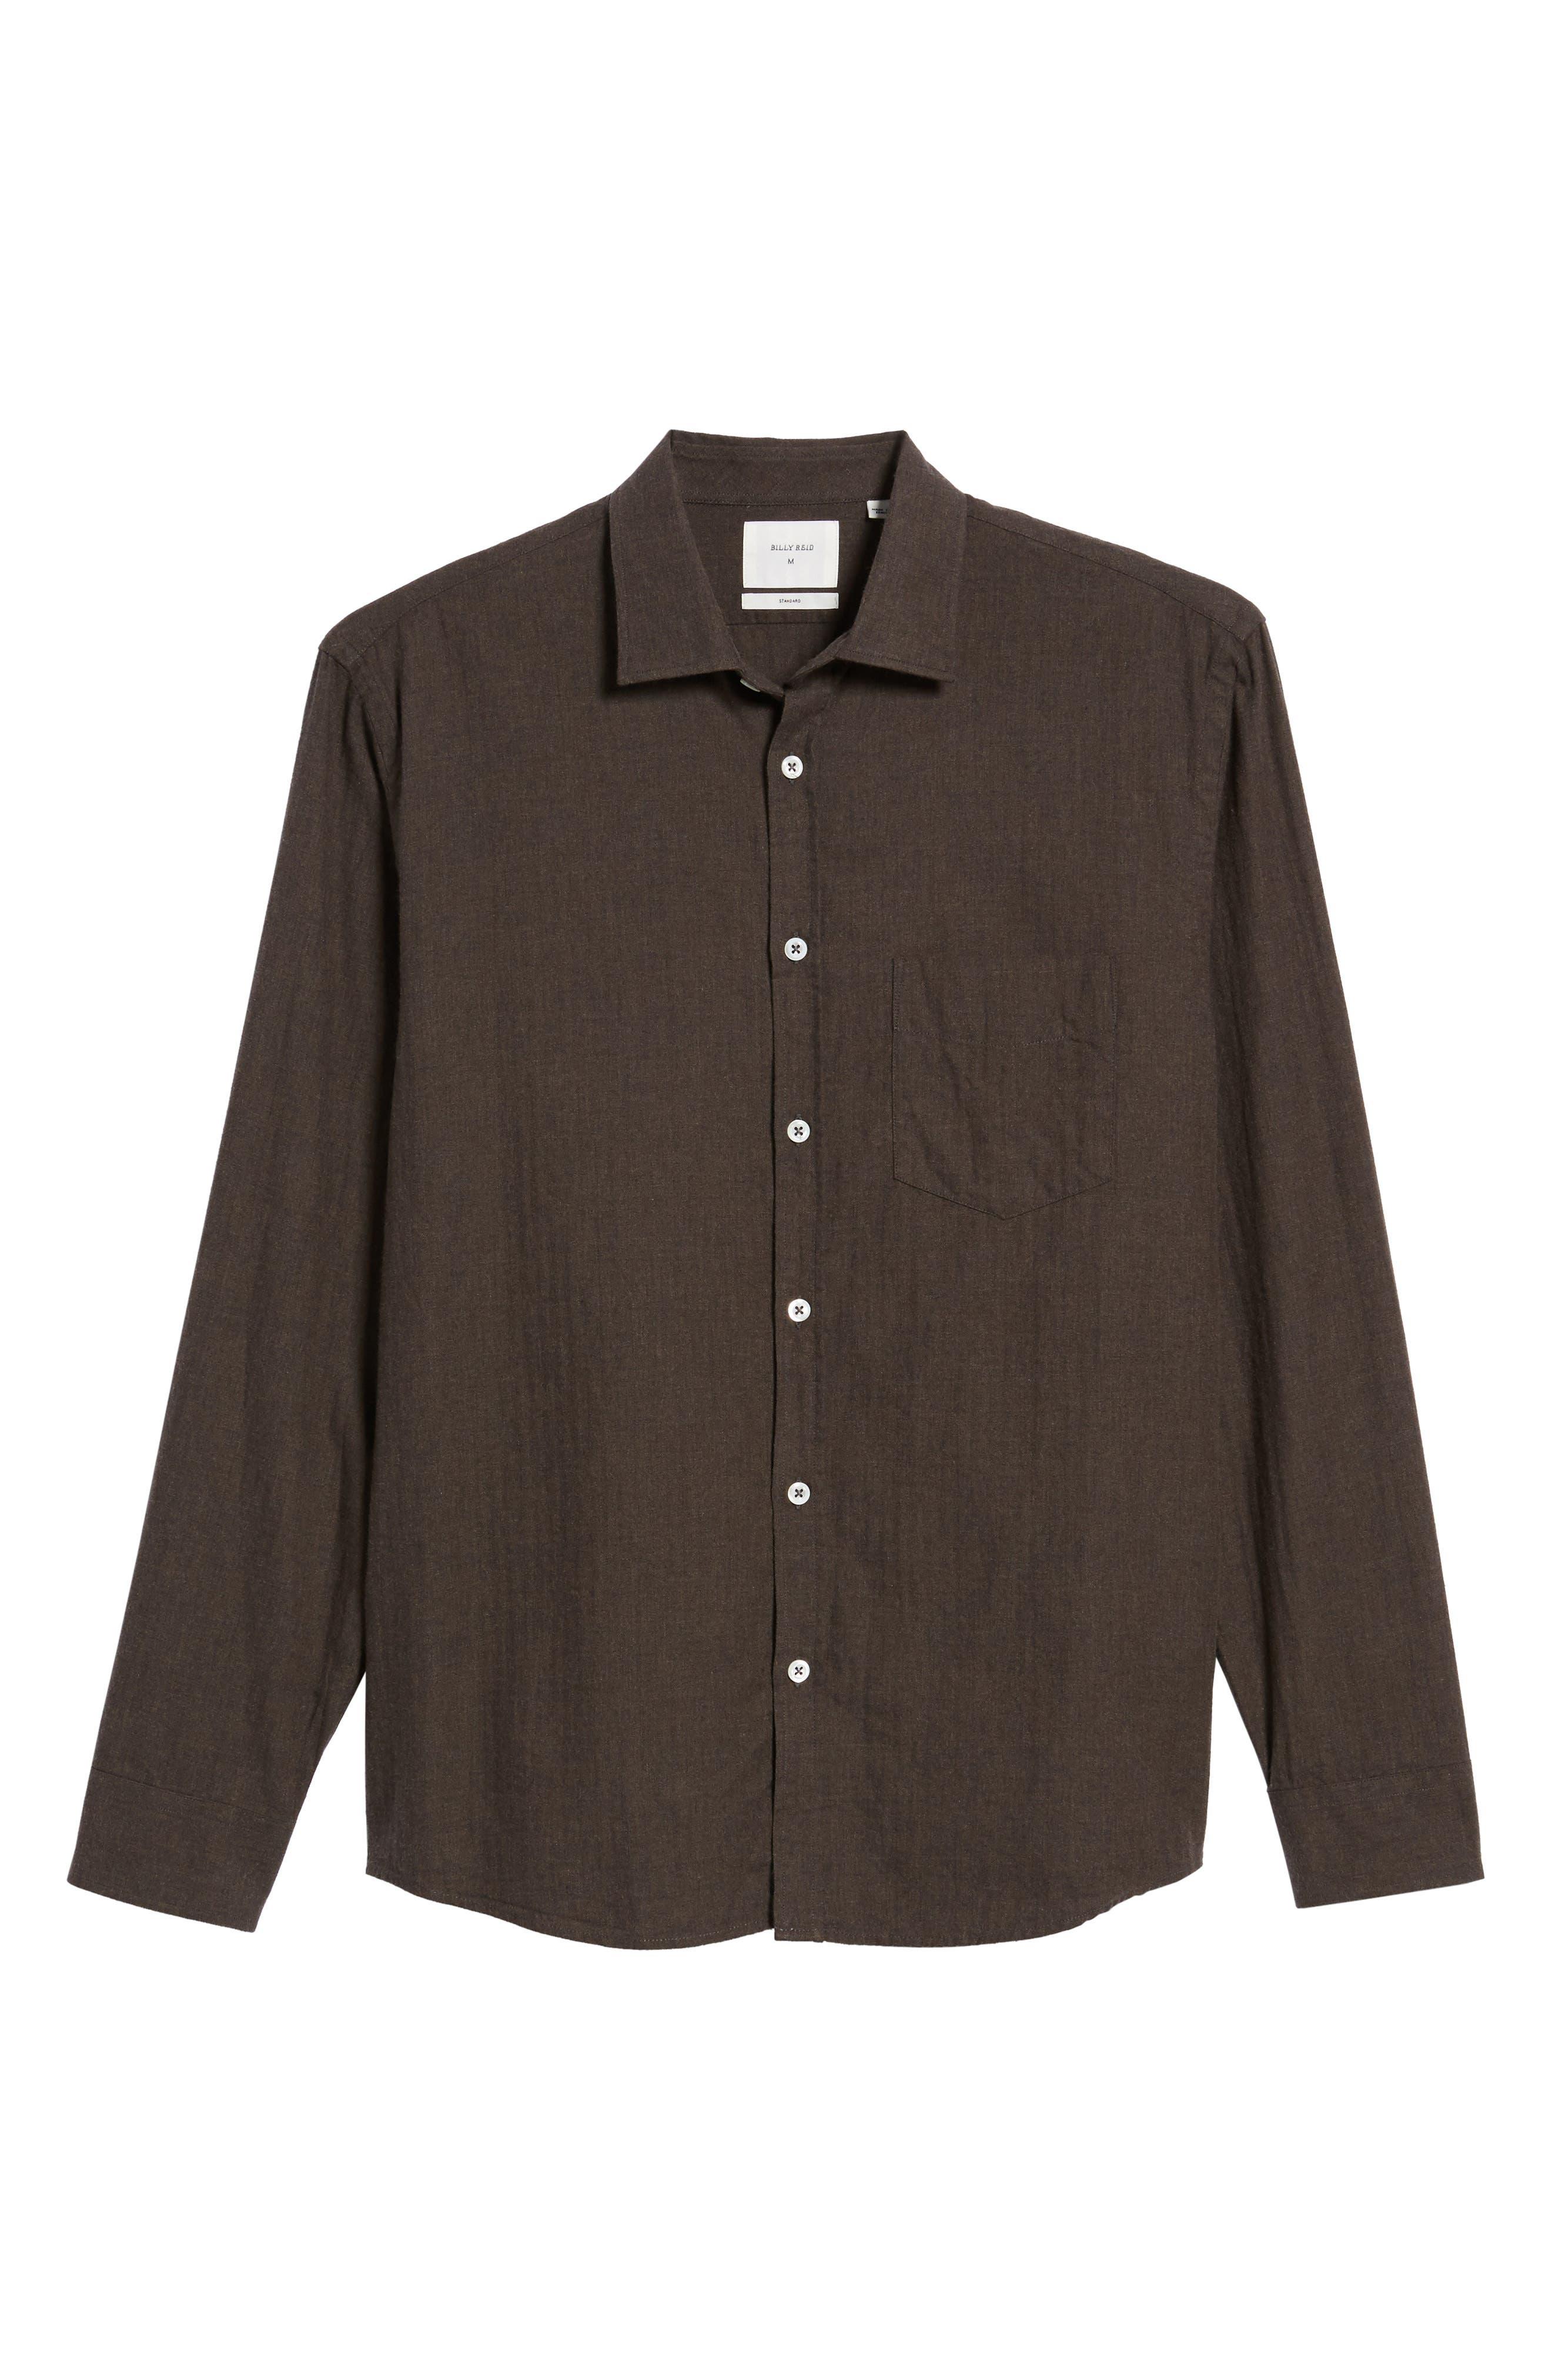 John T Standard Fit Herringbone Shirt,                             Alternate thumbnail 6, color,                             200